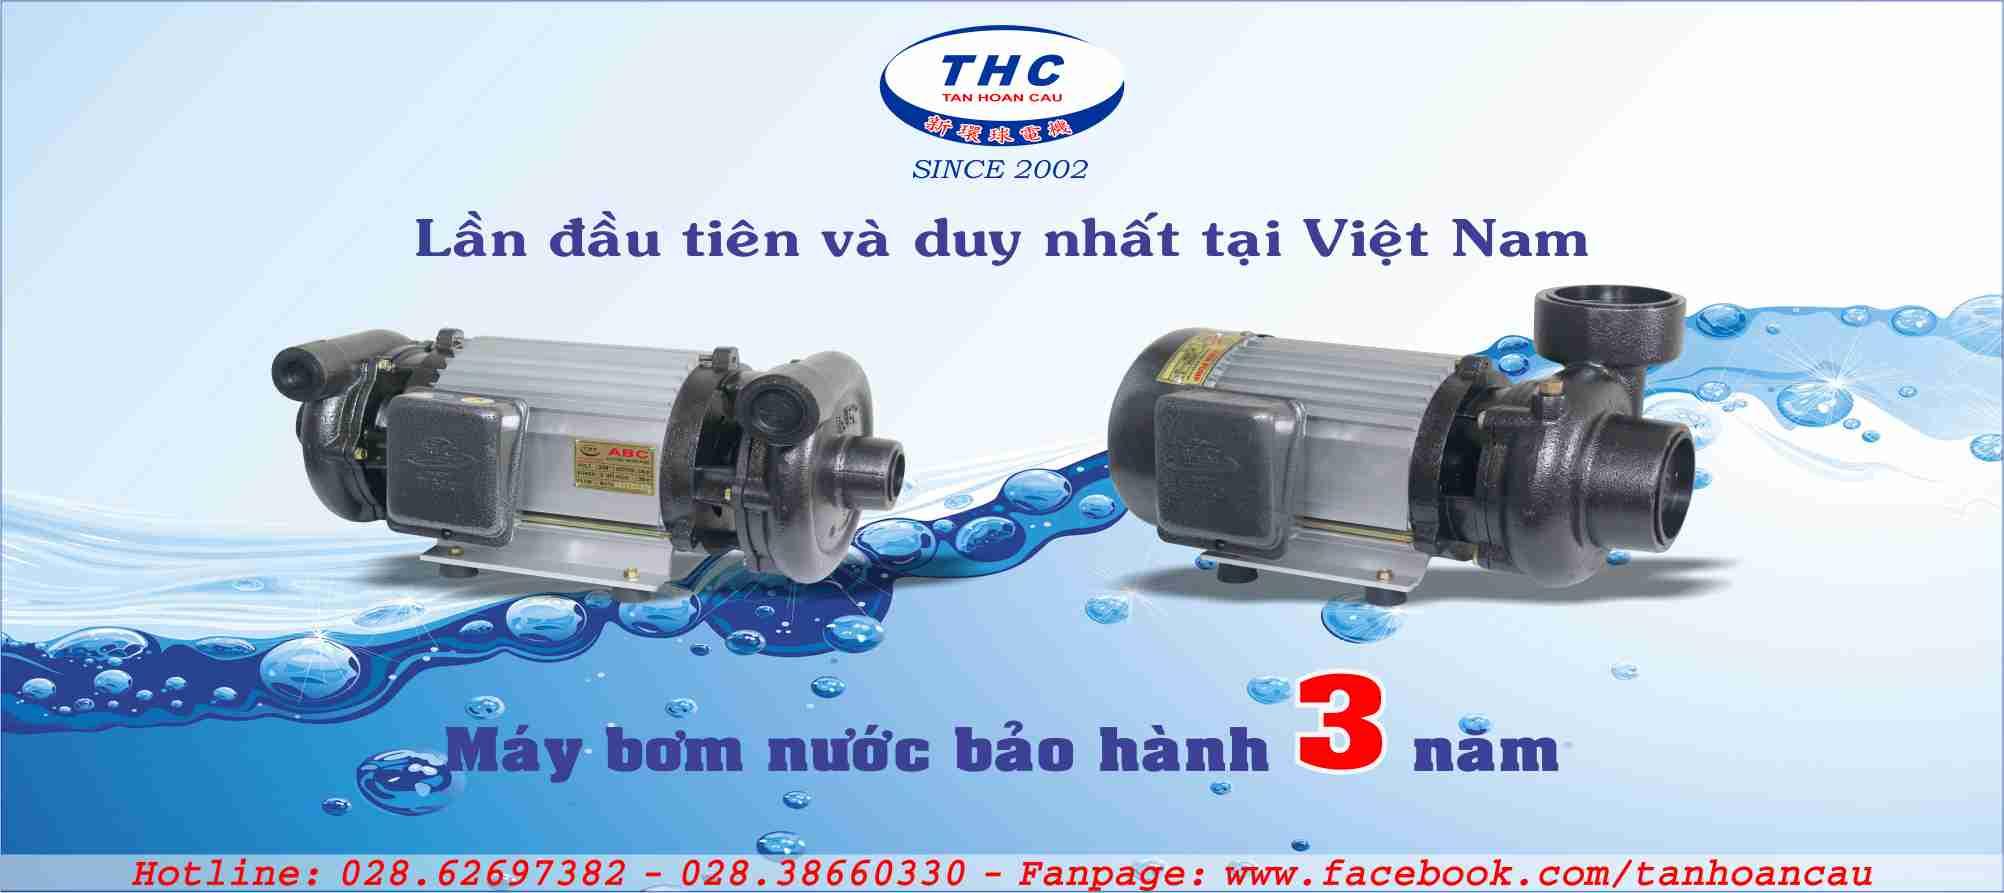 banner web bh 3 nam